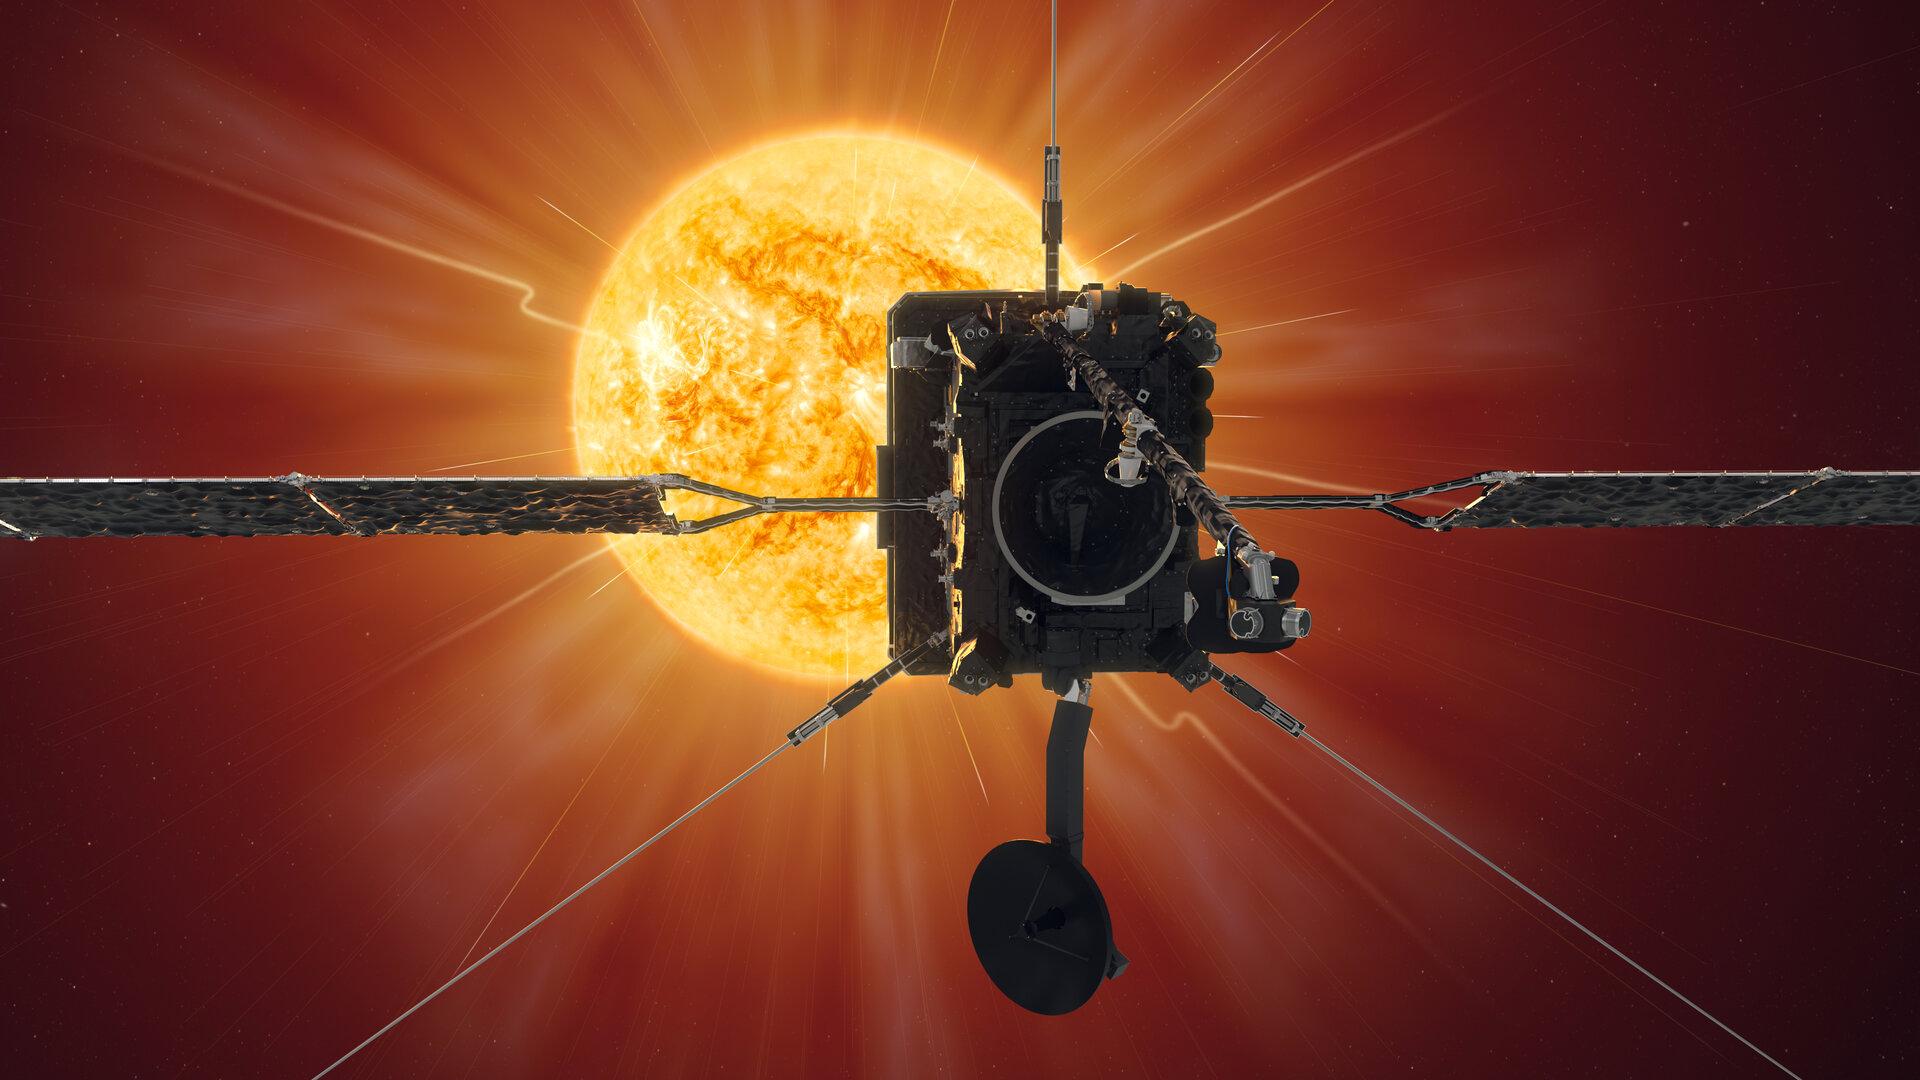 Solar_Orbiter_reaches_first_perihelion_2k.jpg